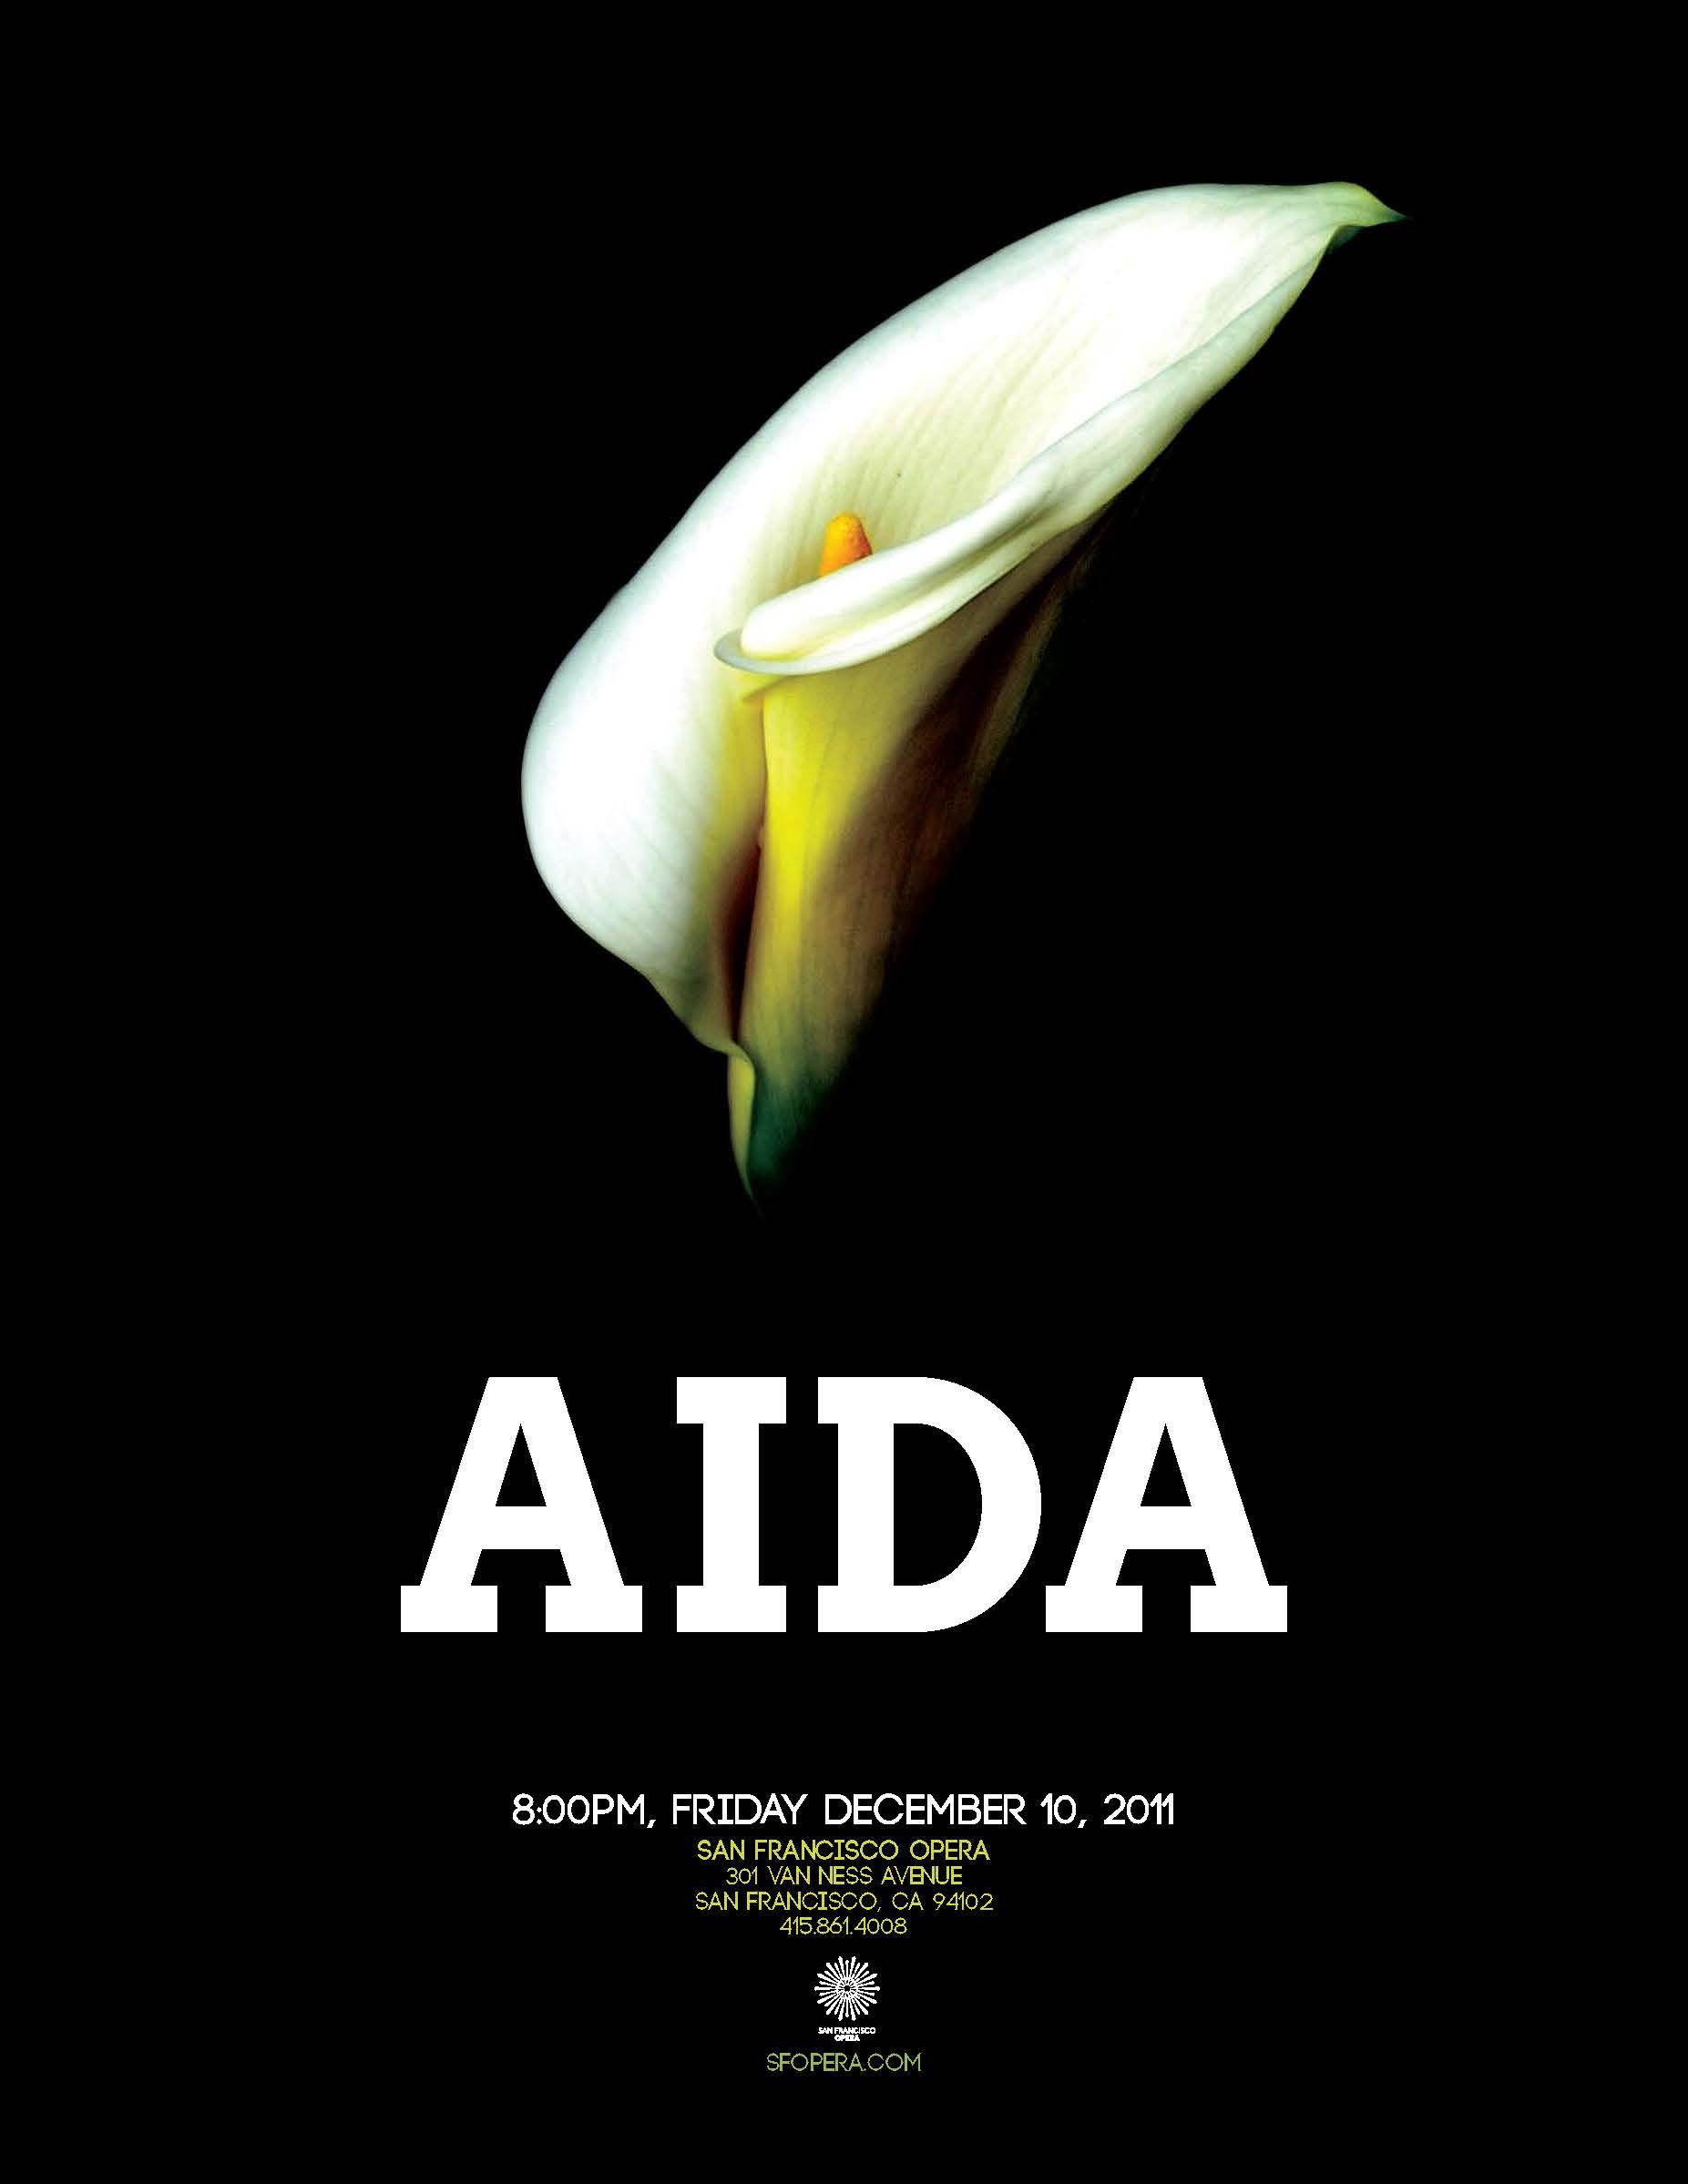 poster_aida.jpg